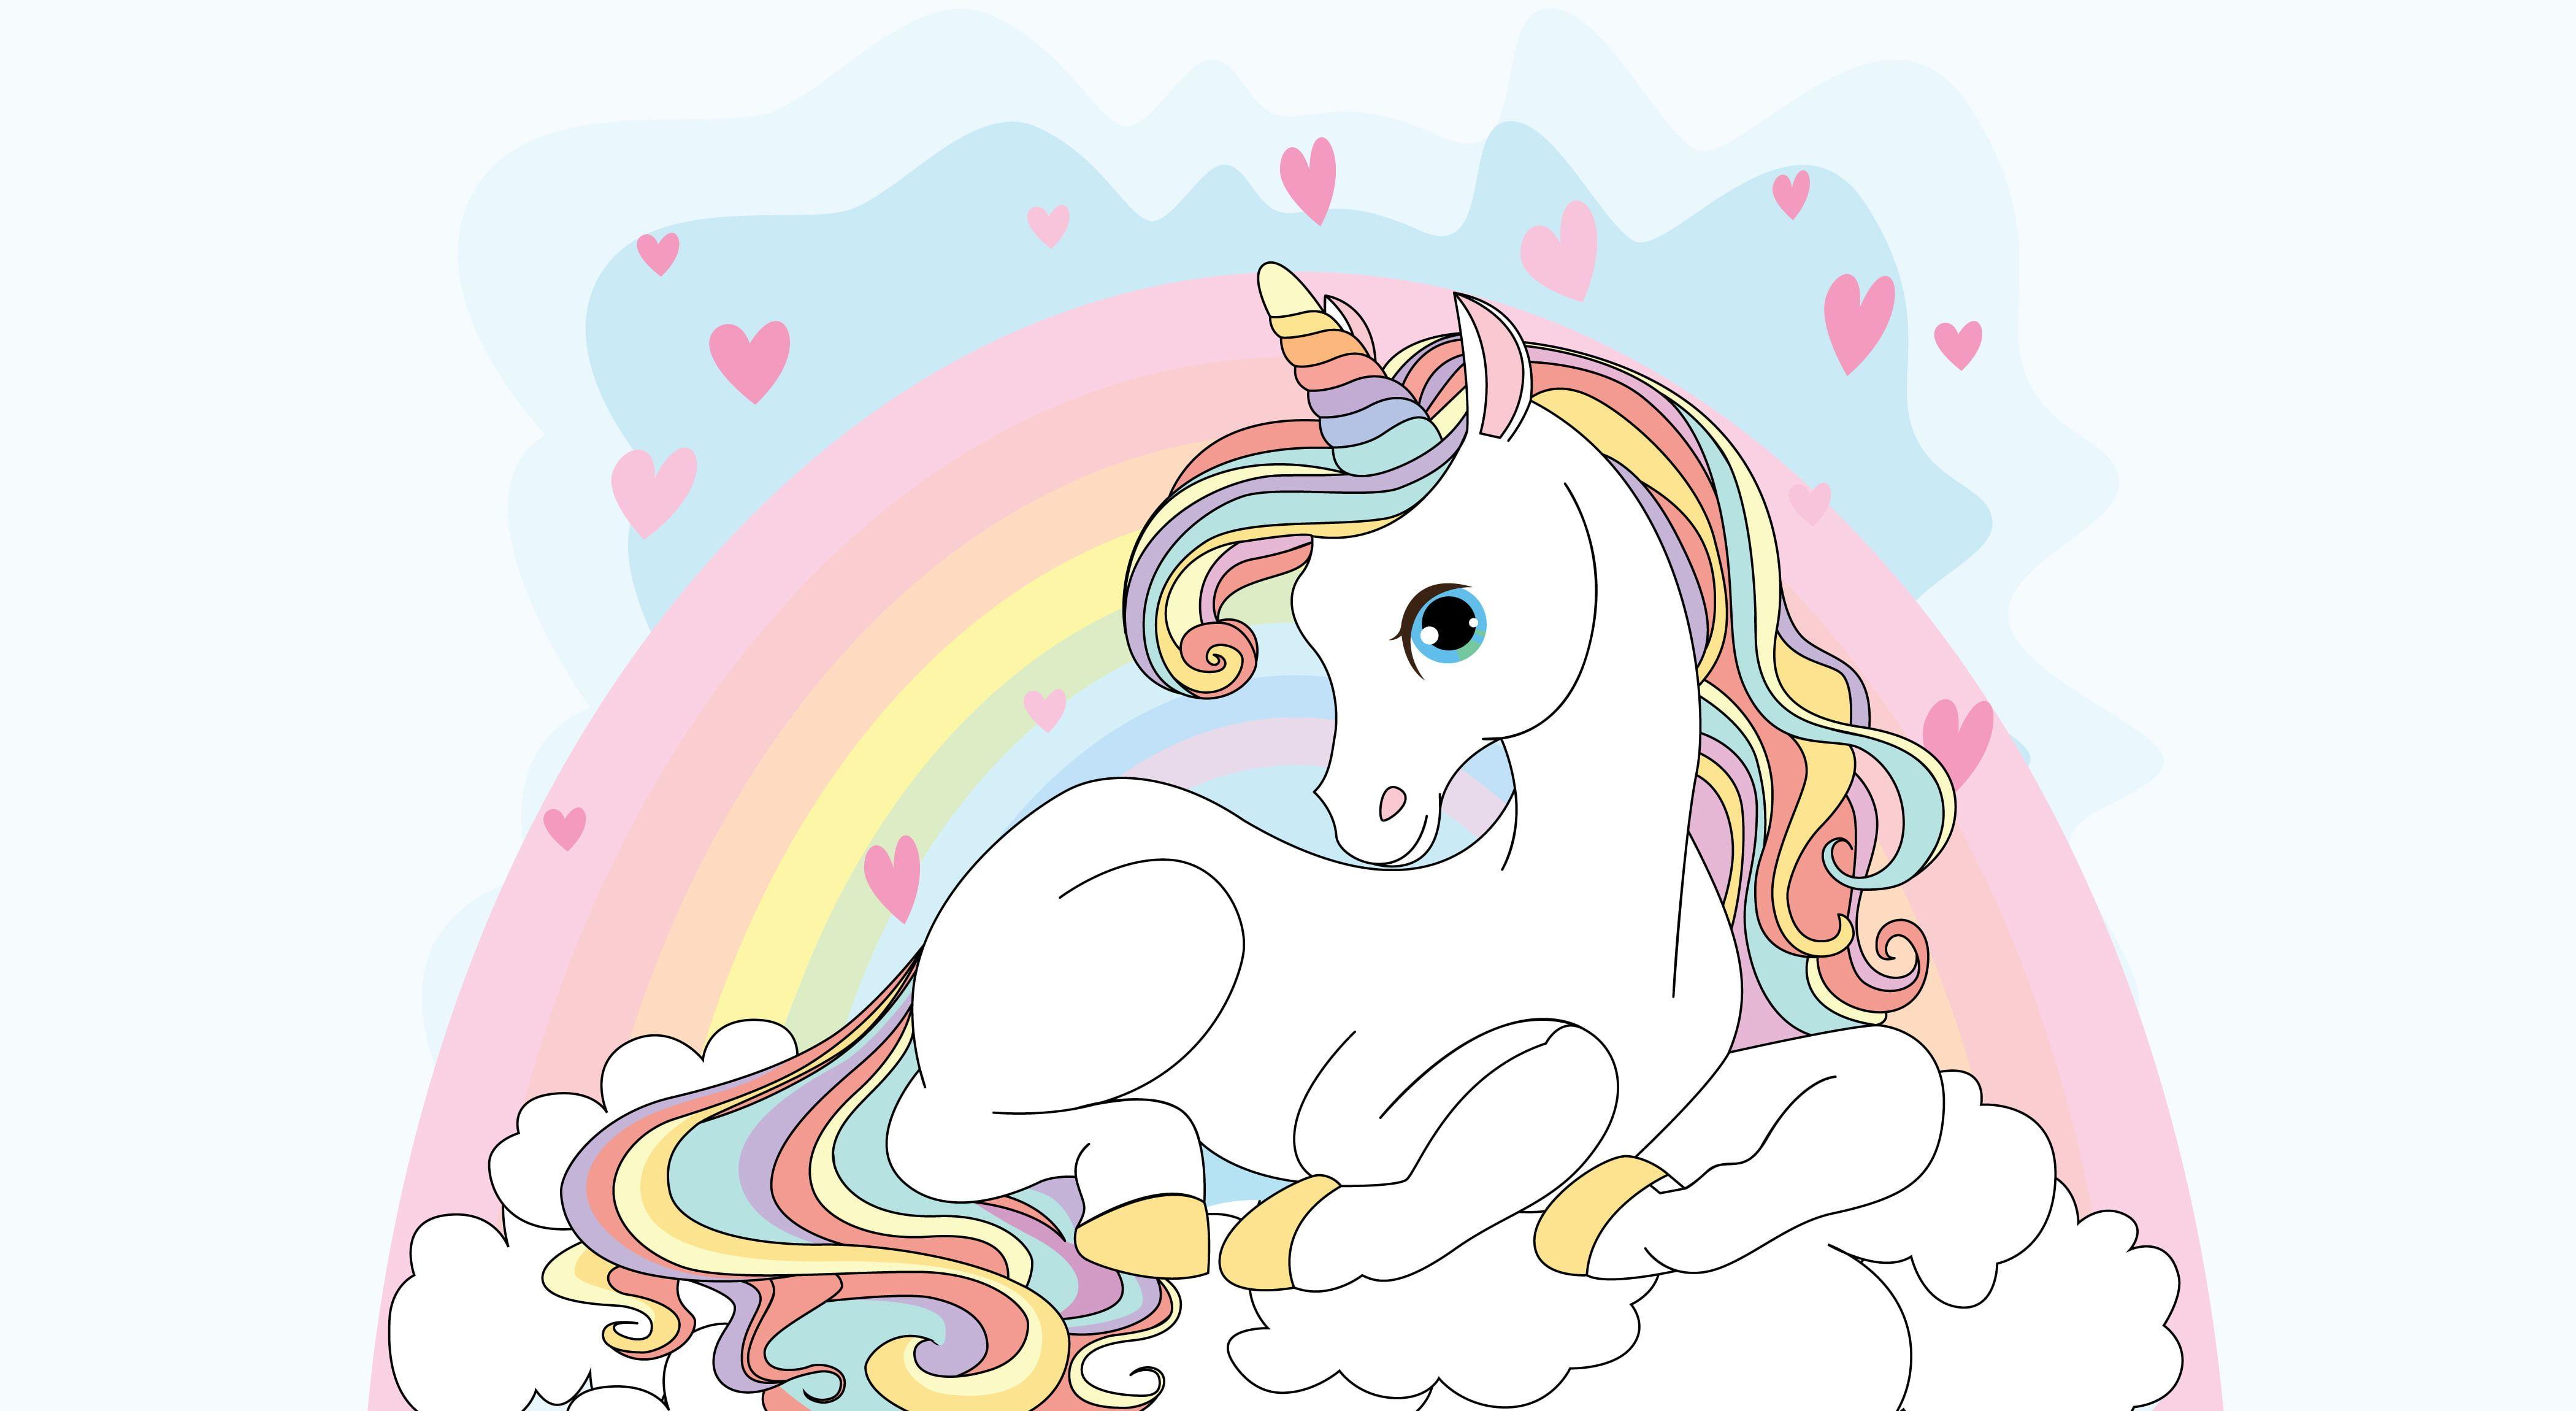 Unicorn Wallpaper Girly Rainbow Hd 4k Unicorn Wallpaper Cute Pink Unicorn Wallpaper Iphone Wallpaper Unicorn